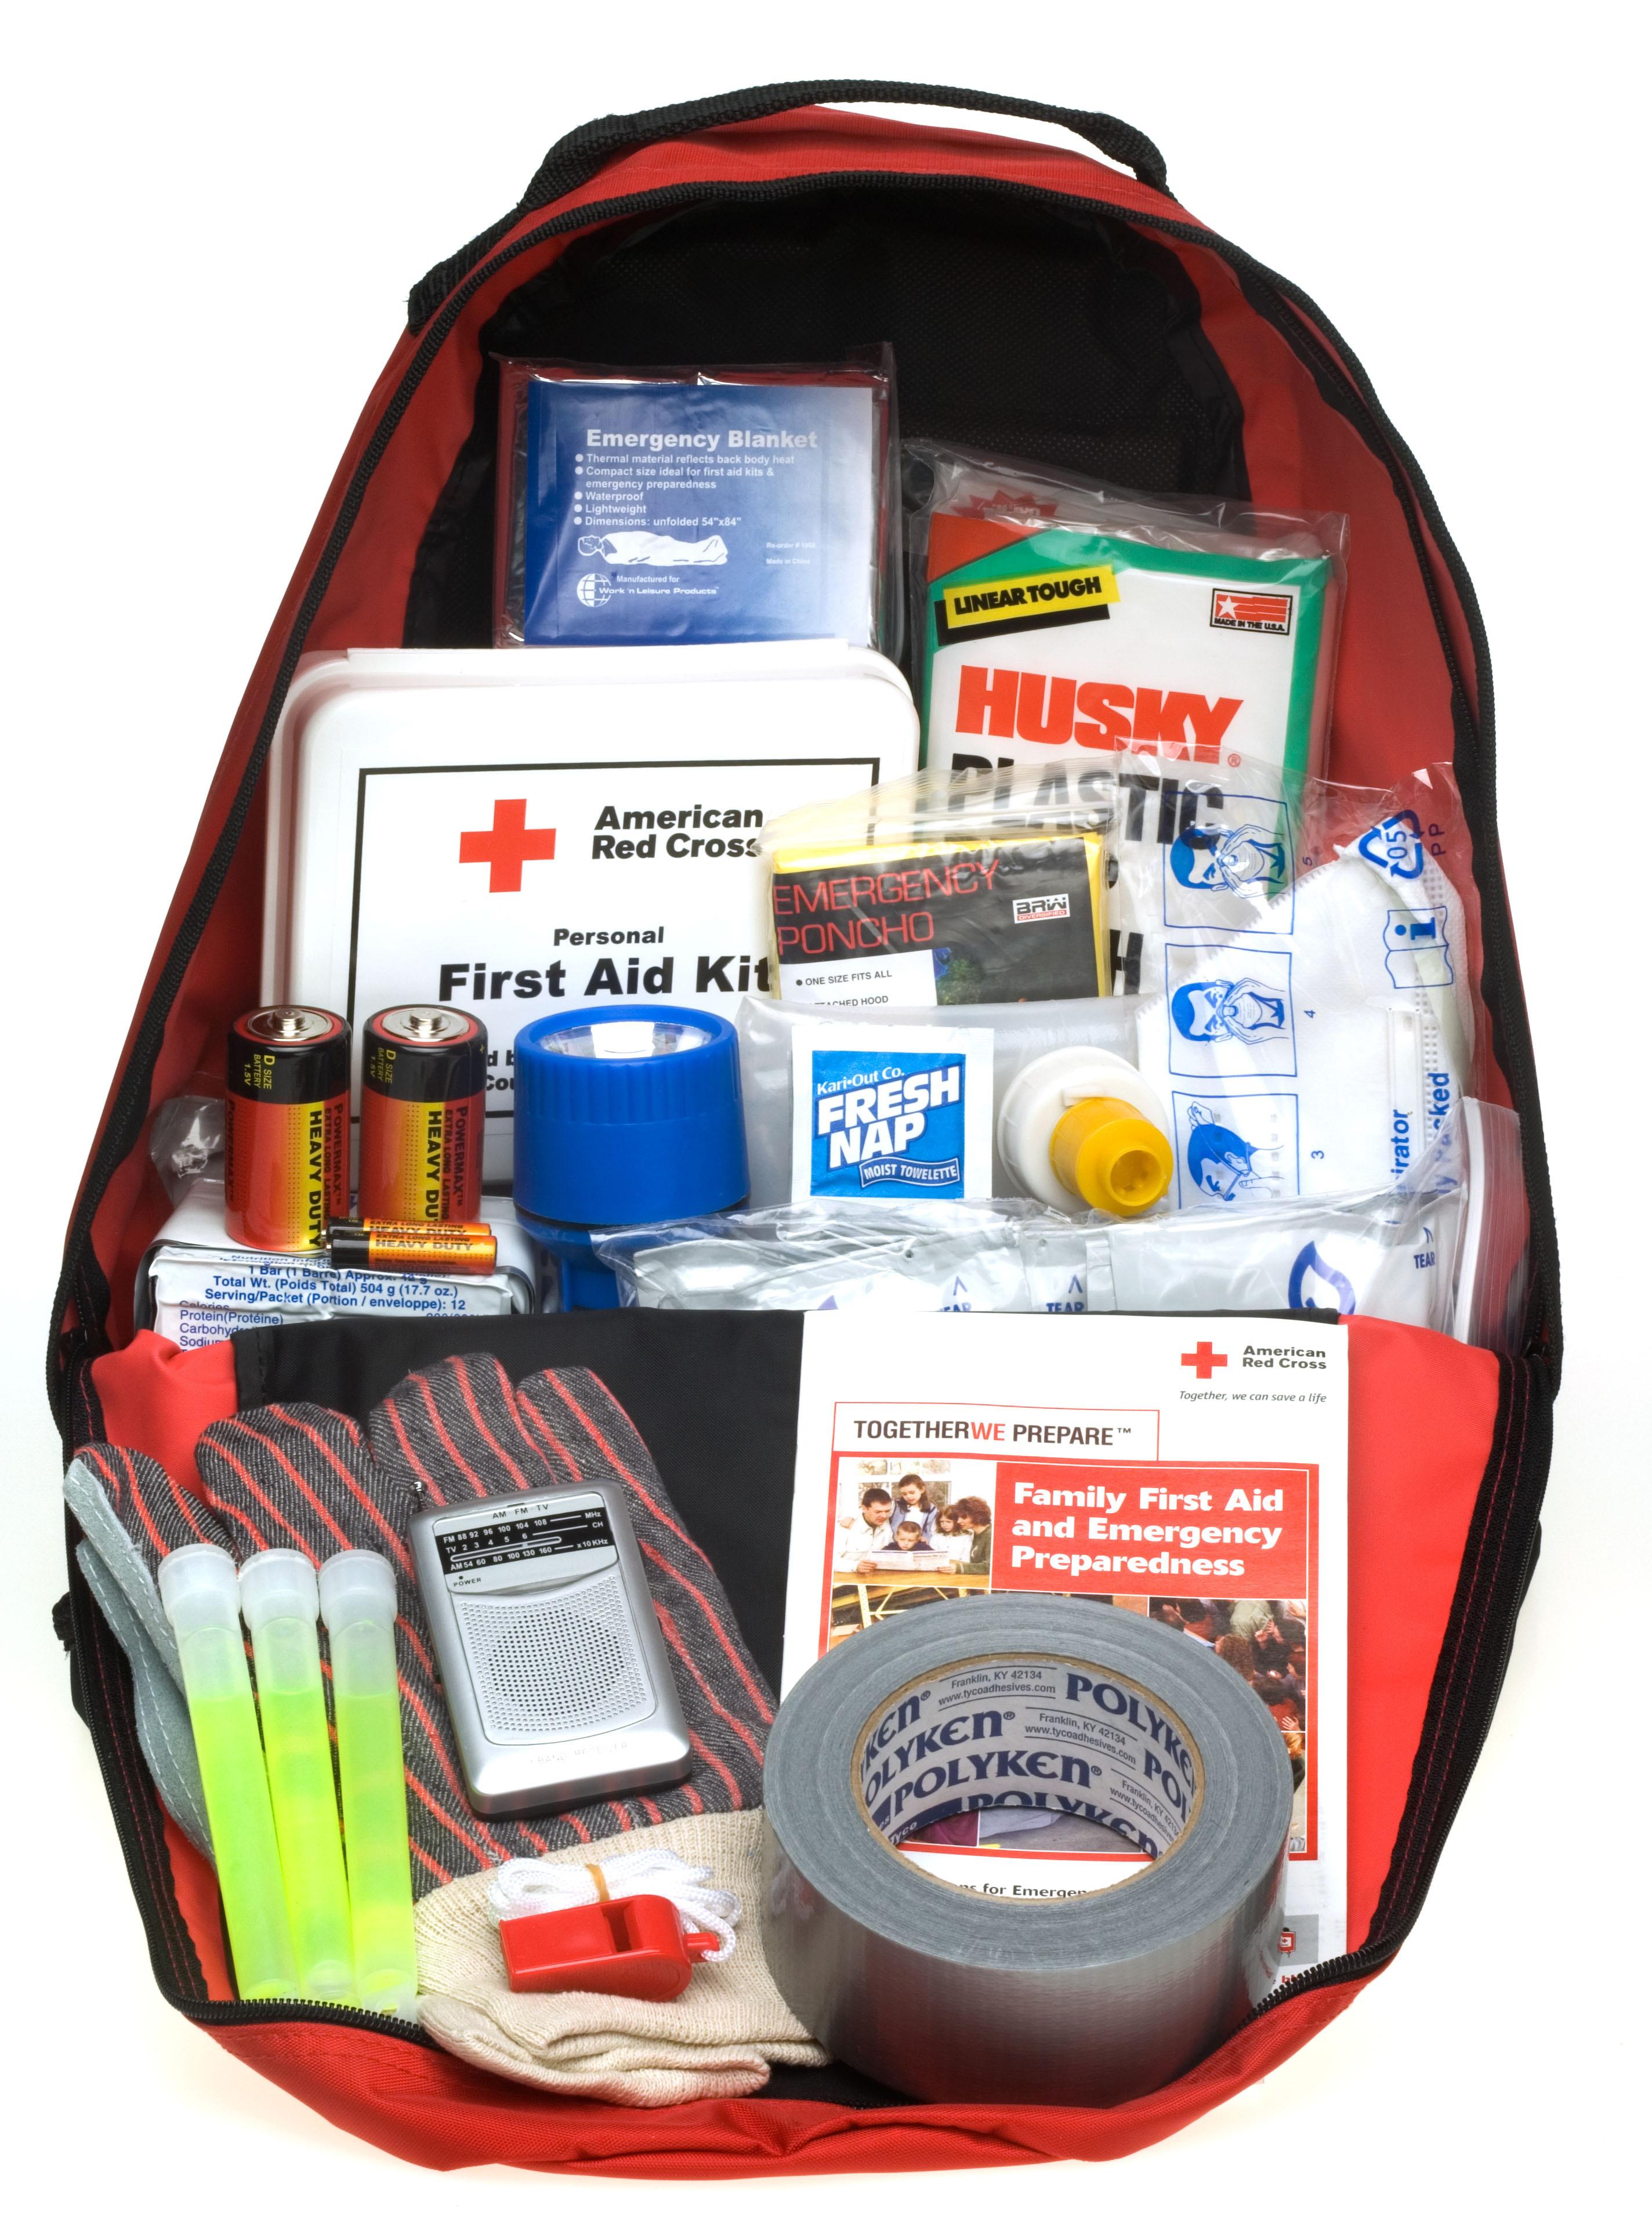 Preparing A Home Emergency Kit